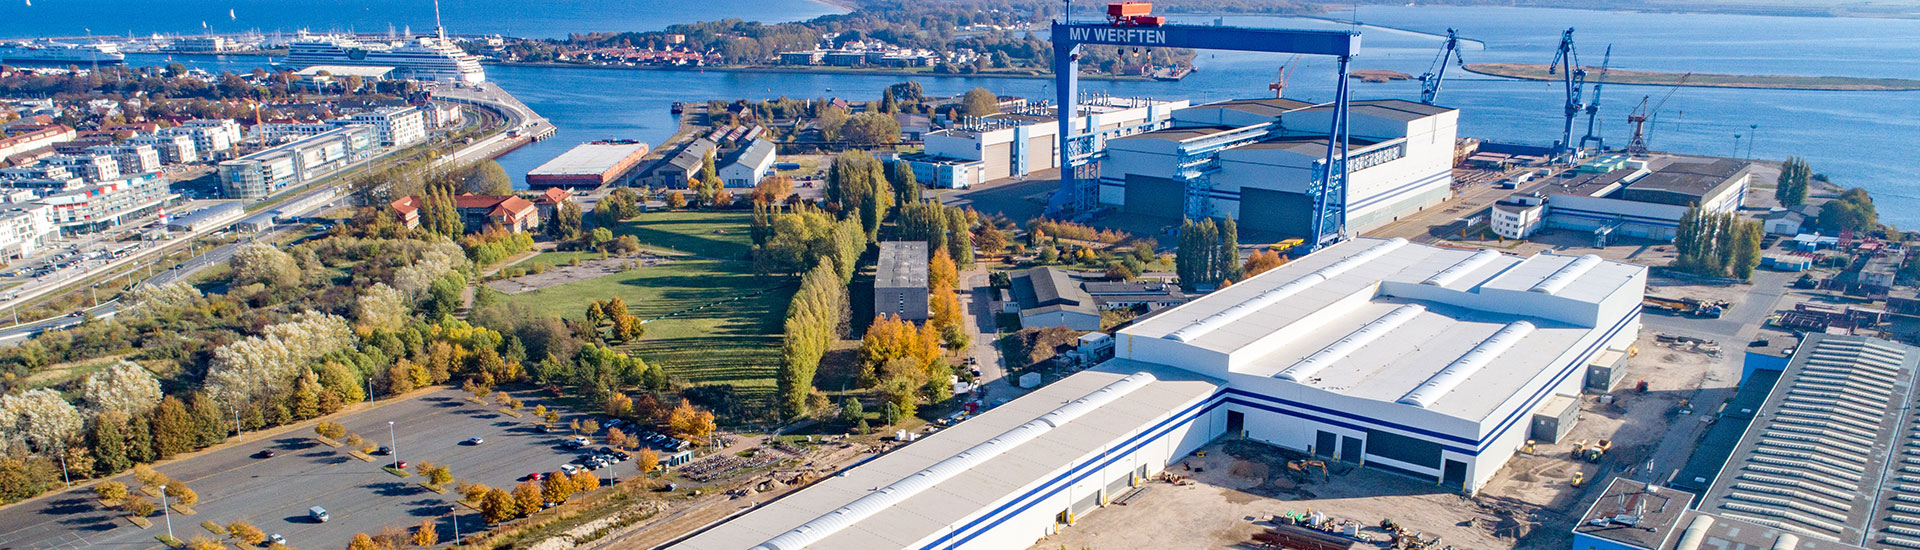 Werften In Rostock